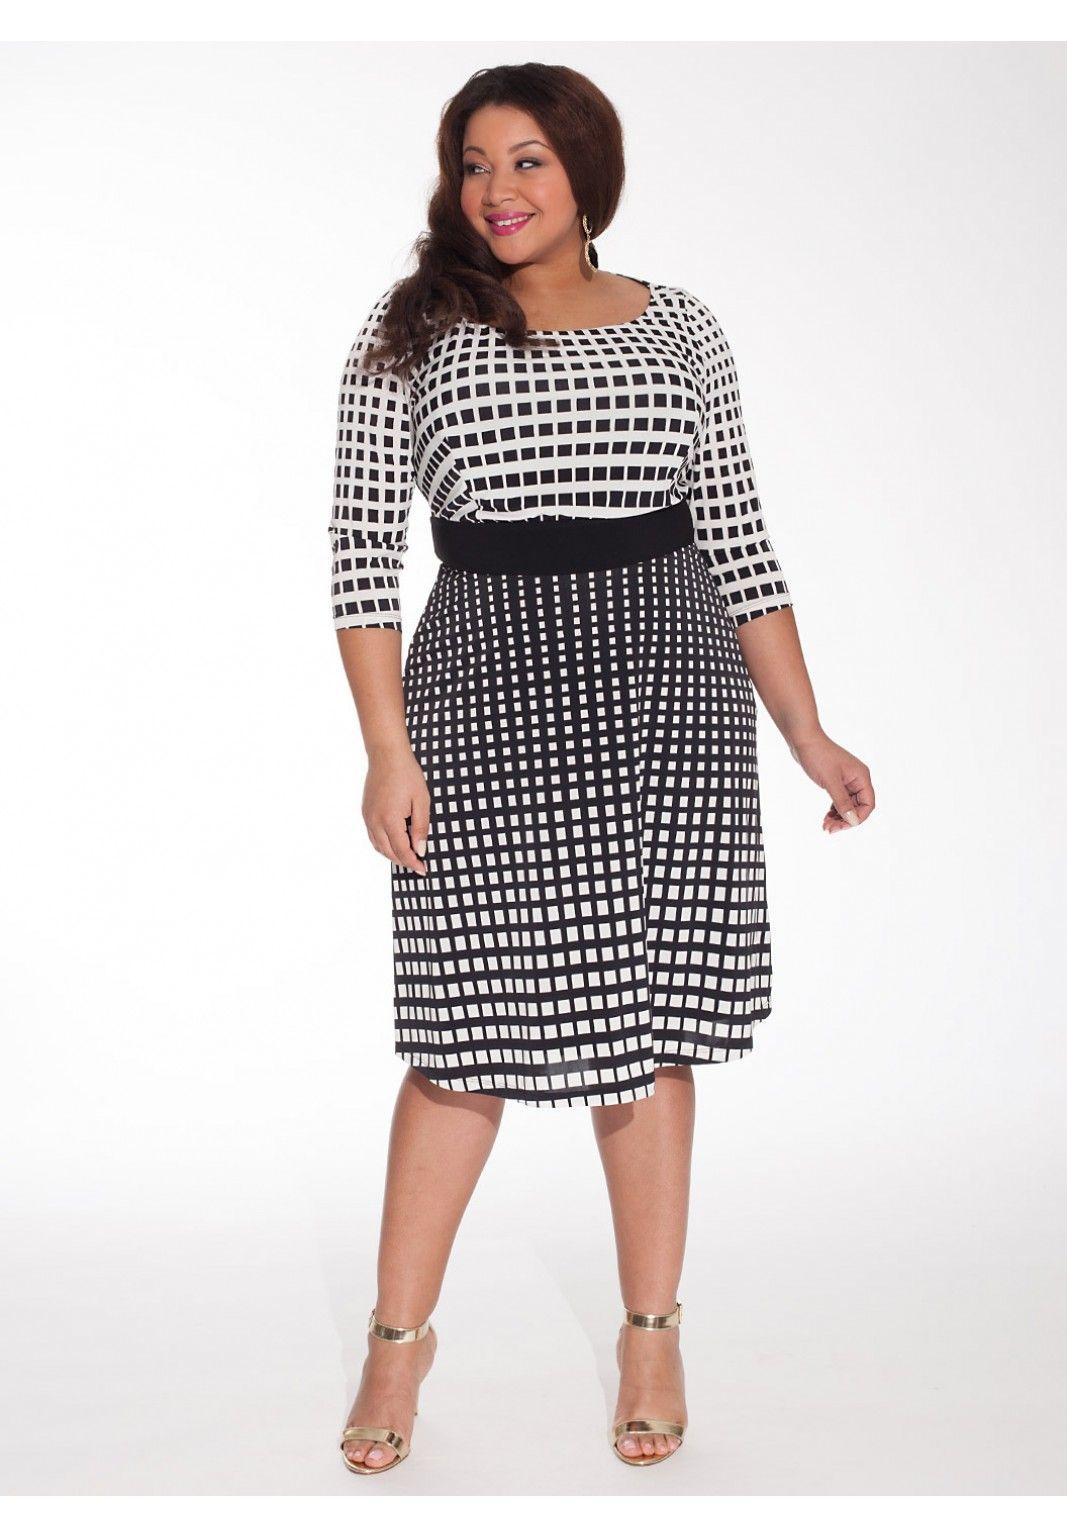 ad52632c15 Deora Dress